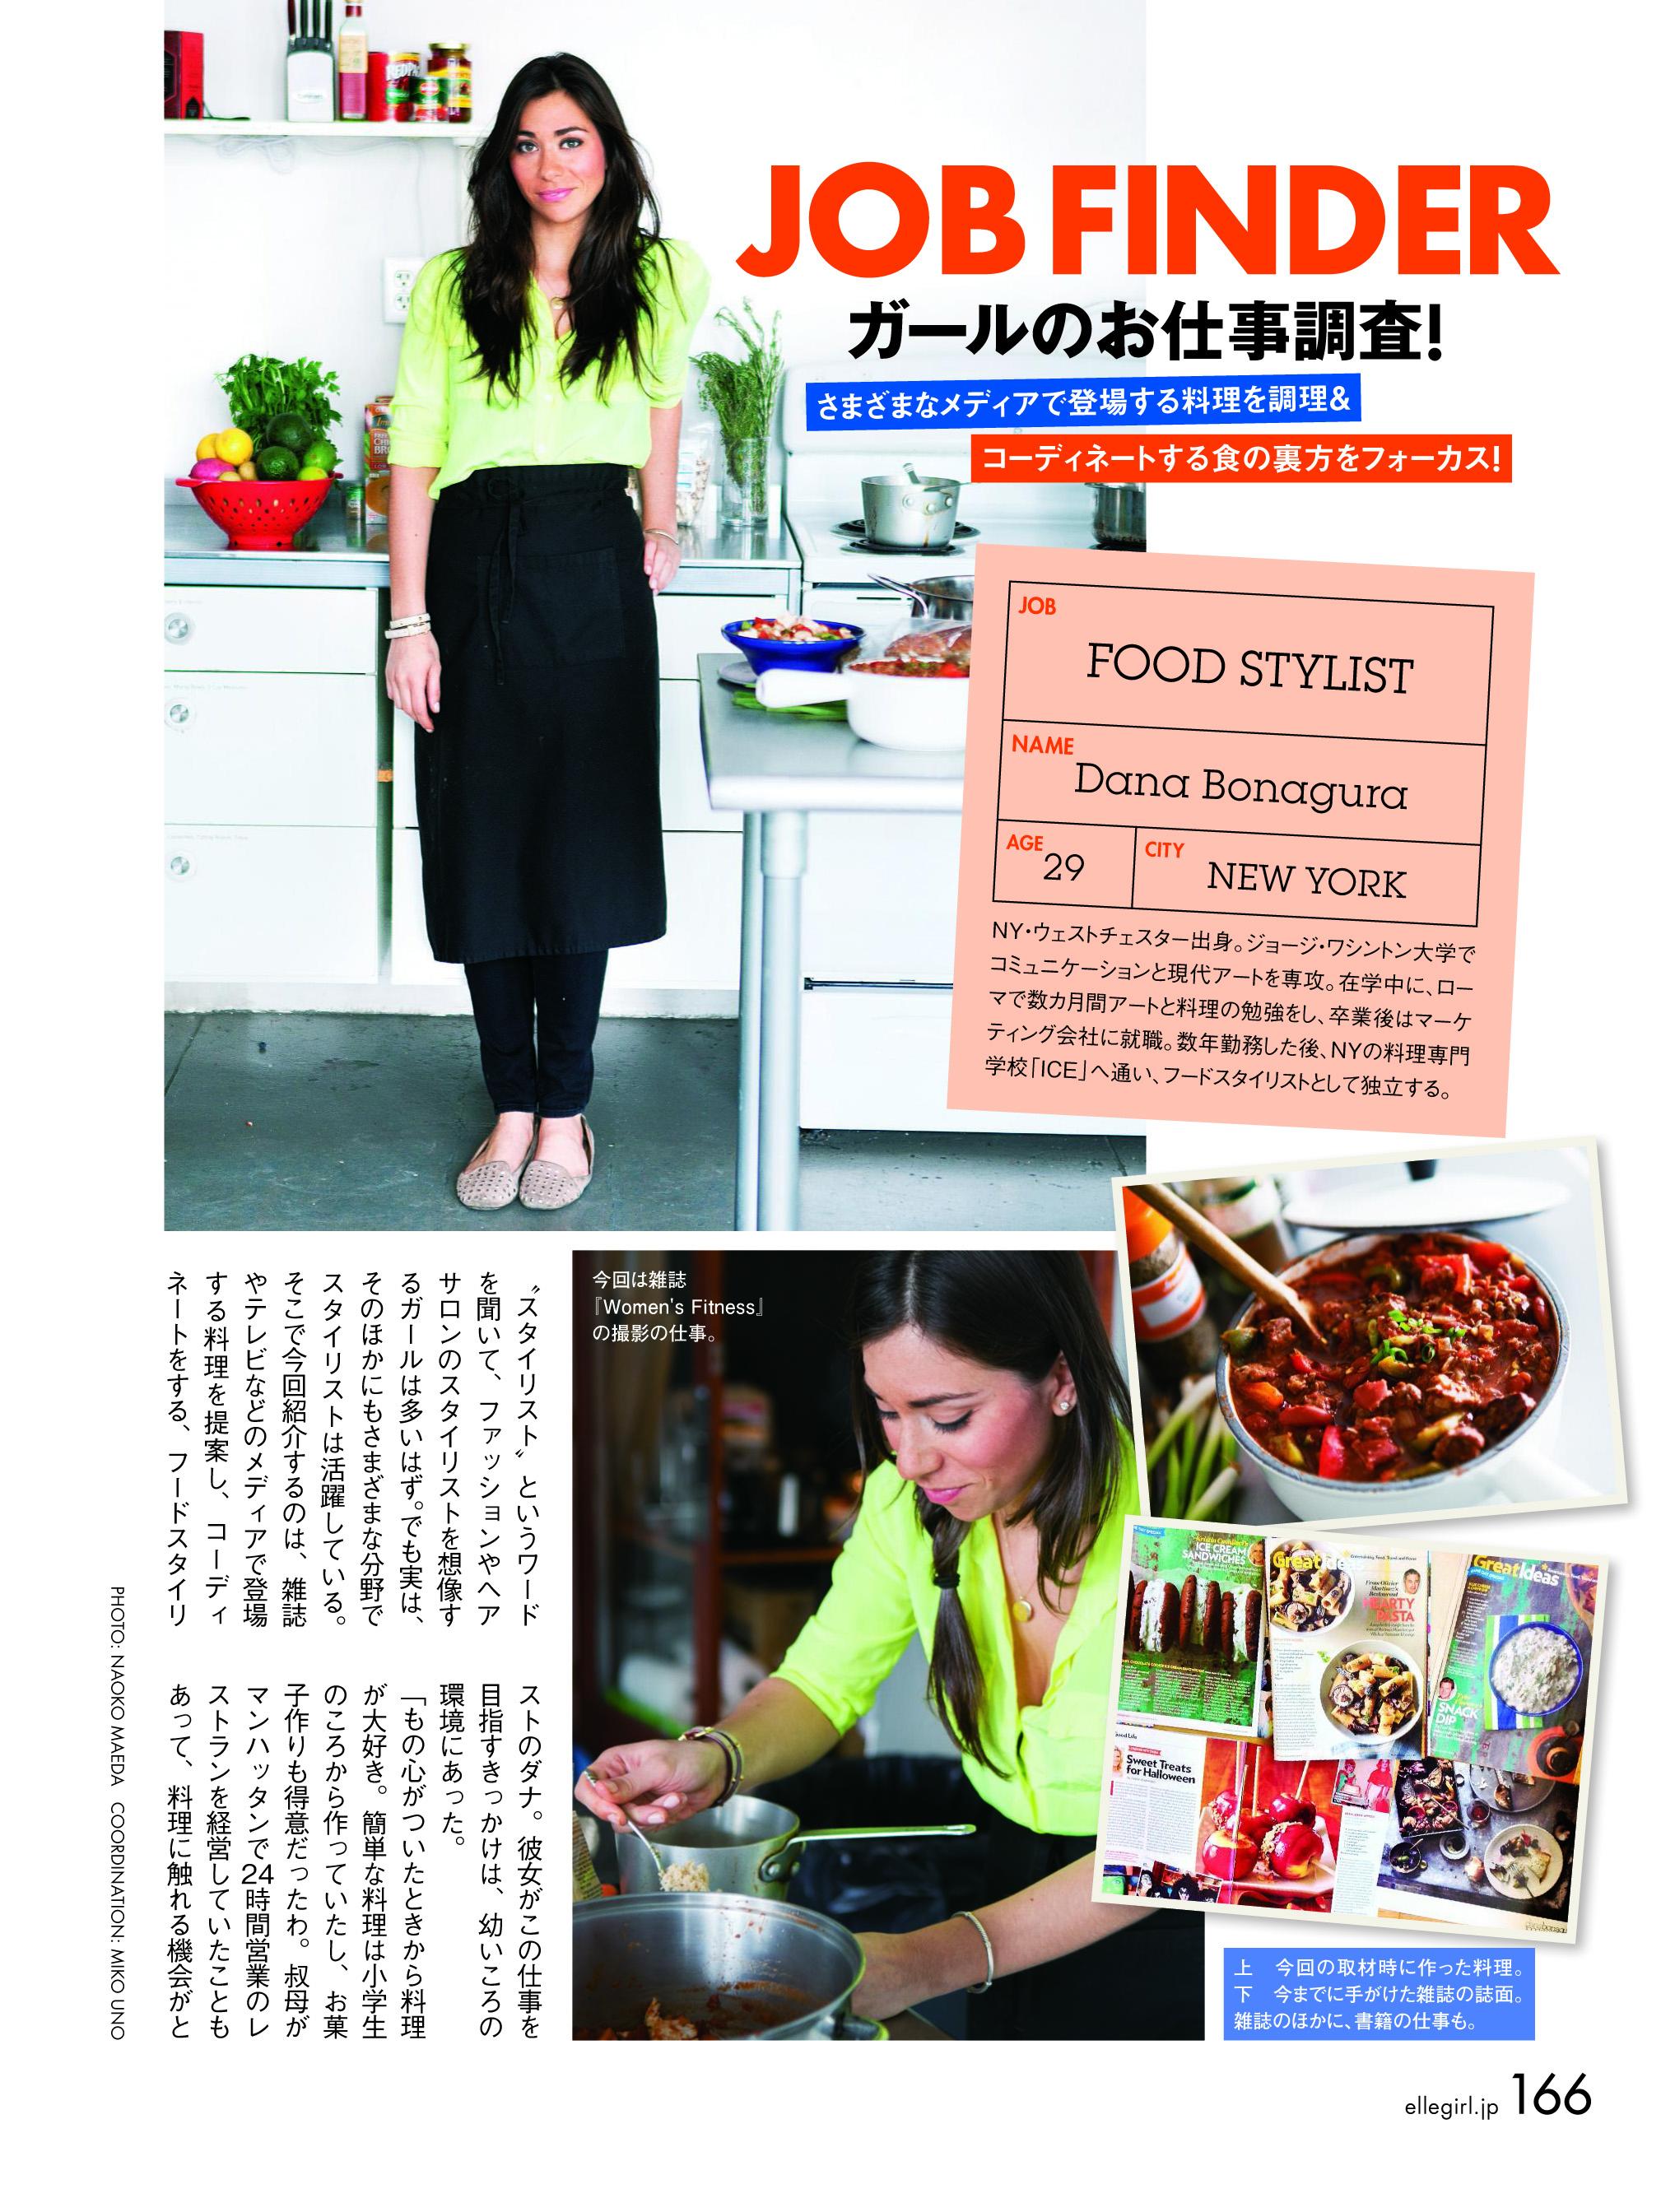 Elle Japan Interview 1.jpg